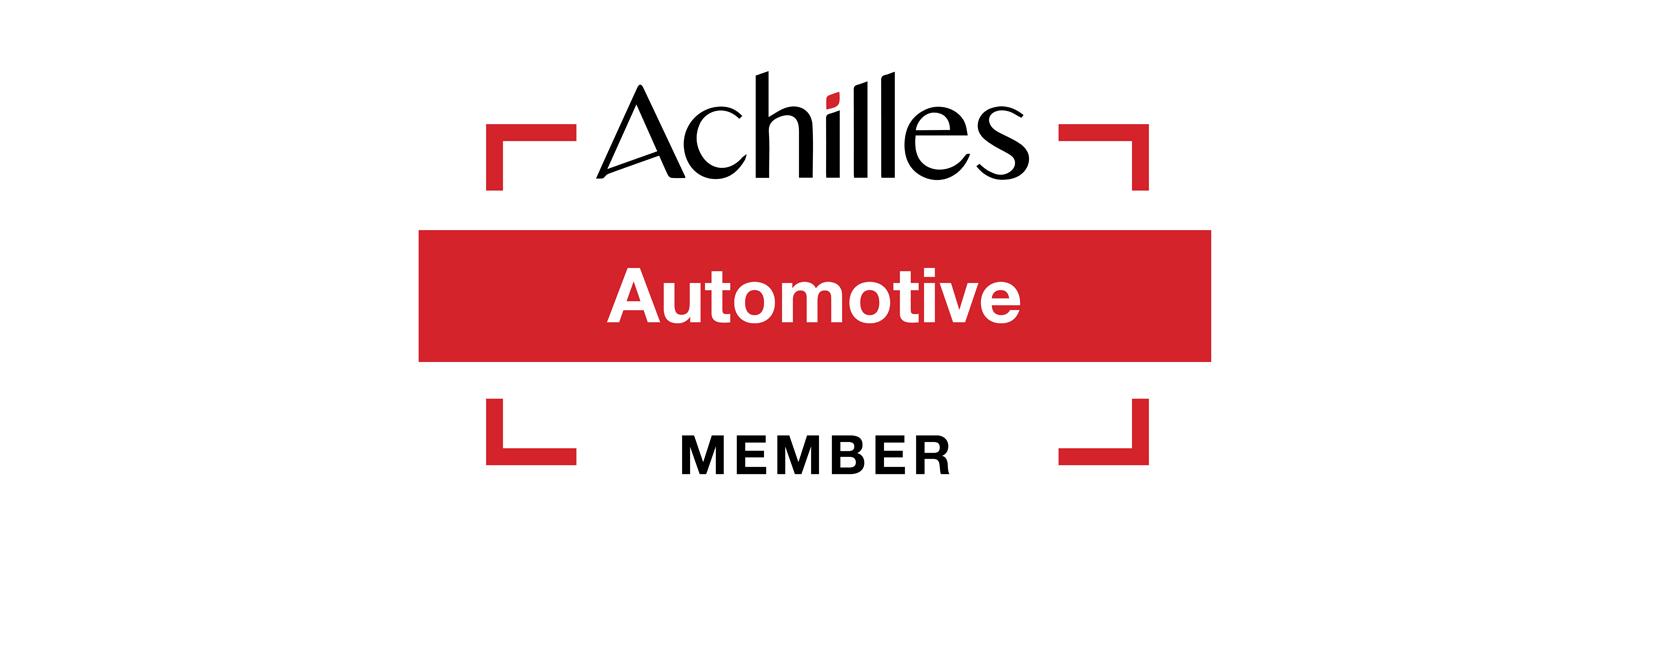 AOK加入Achilles Automotive并获得批准的供应商地位